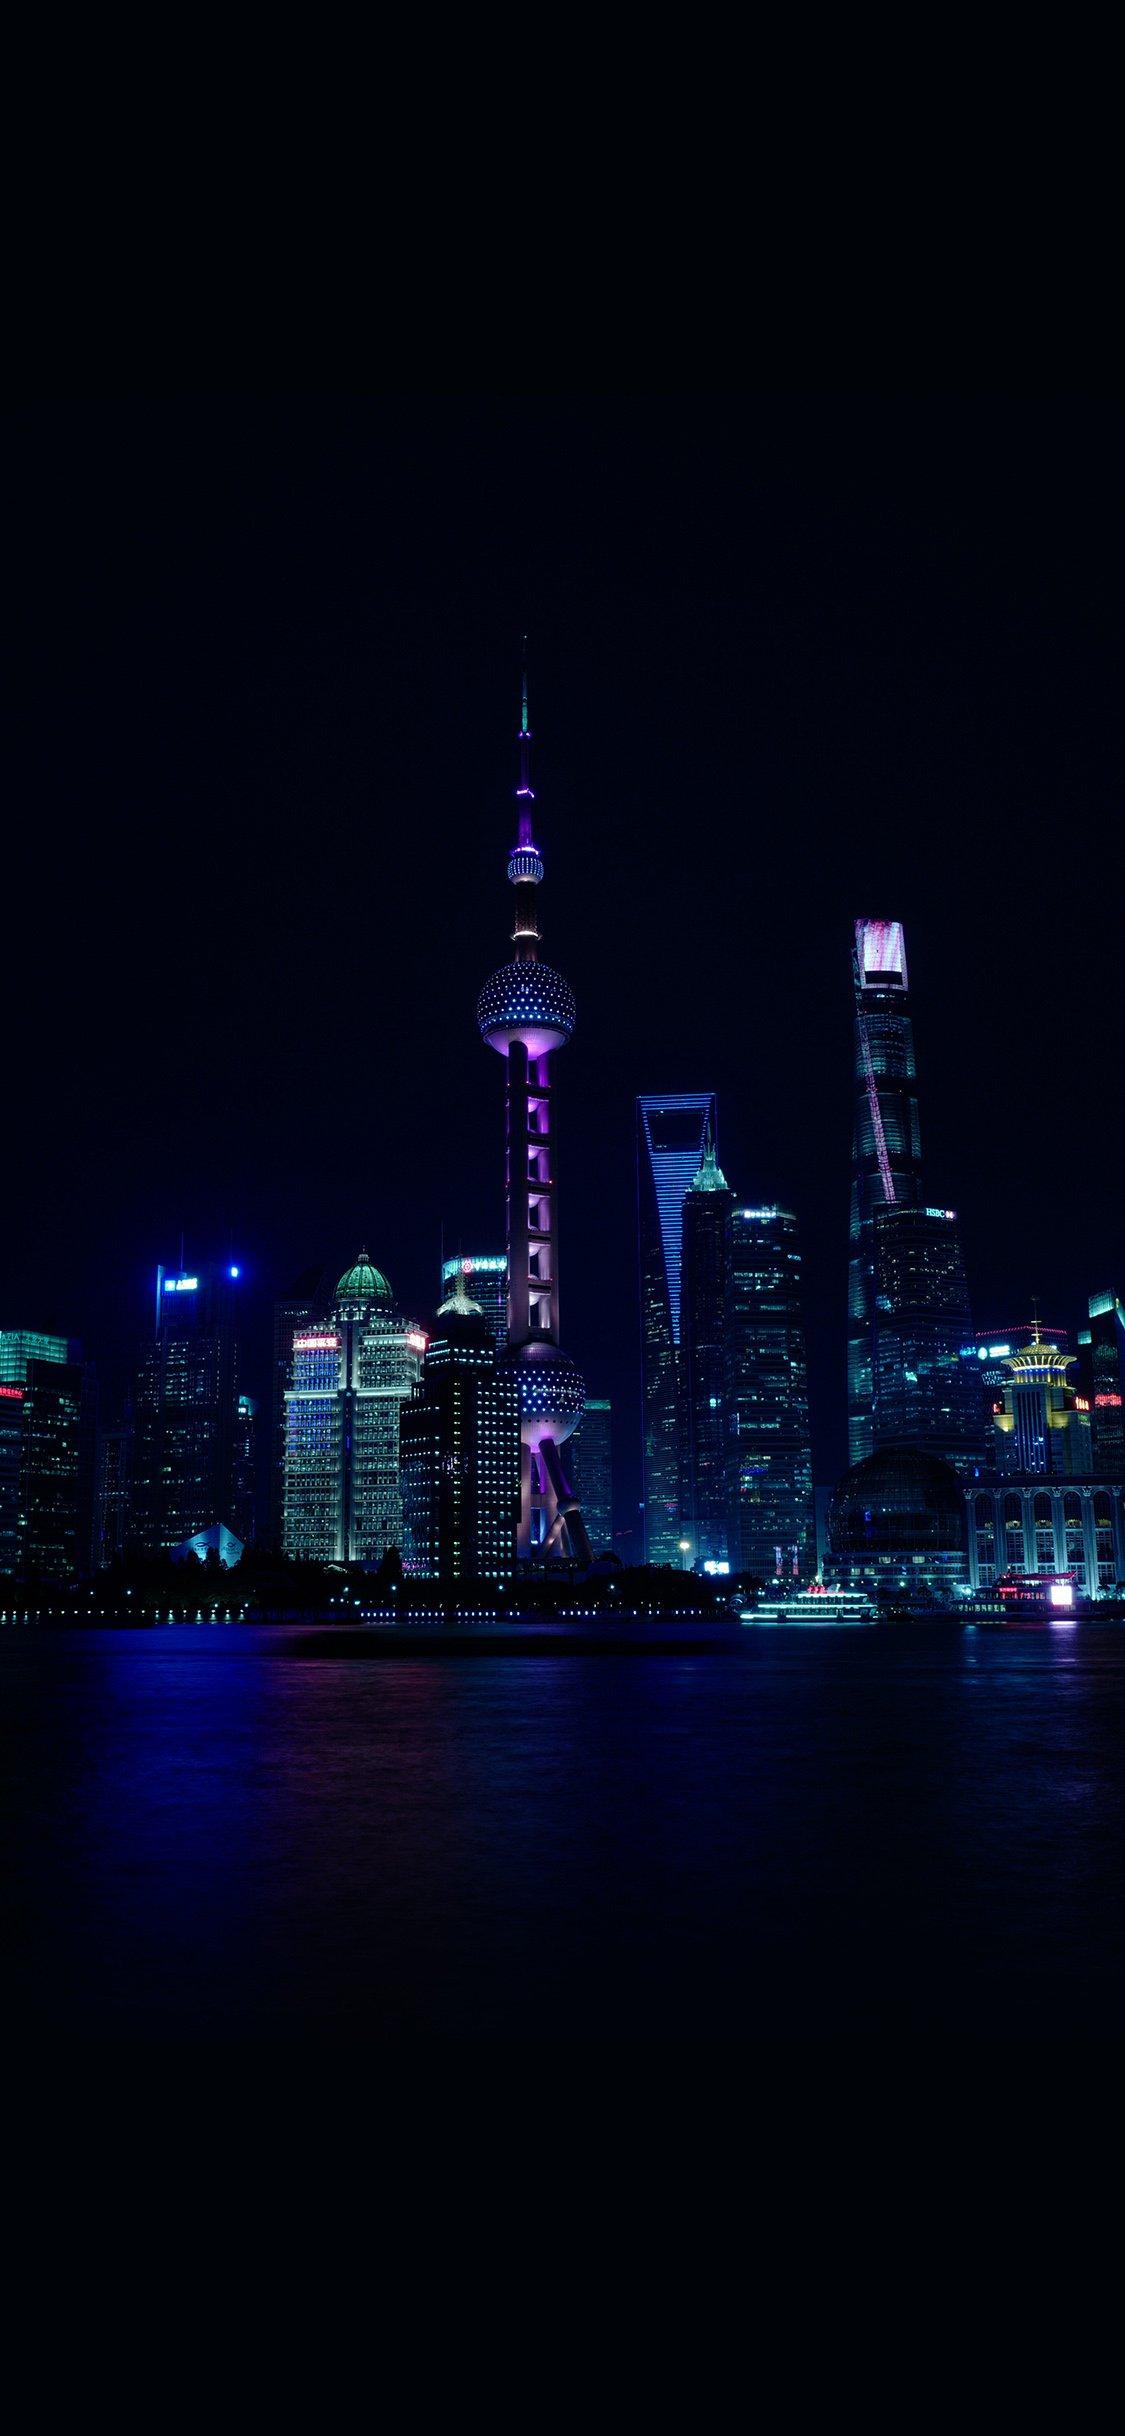 China night city iPhone X wallpaper